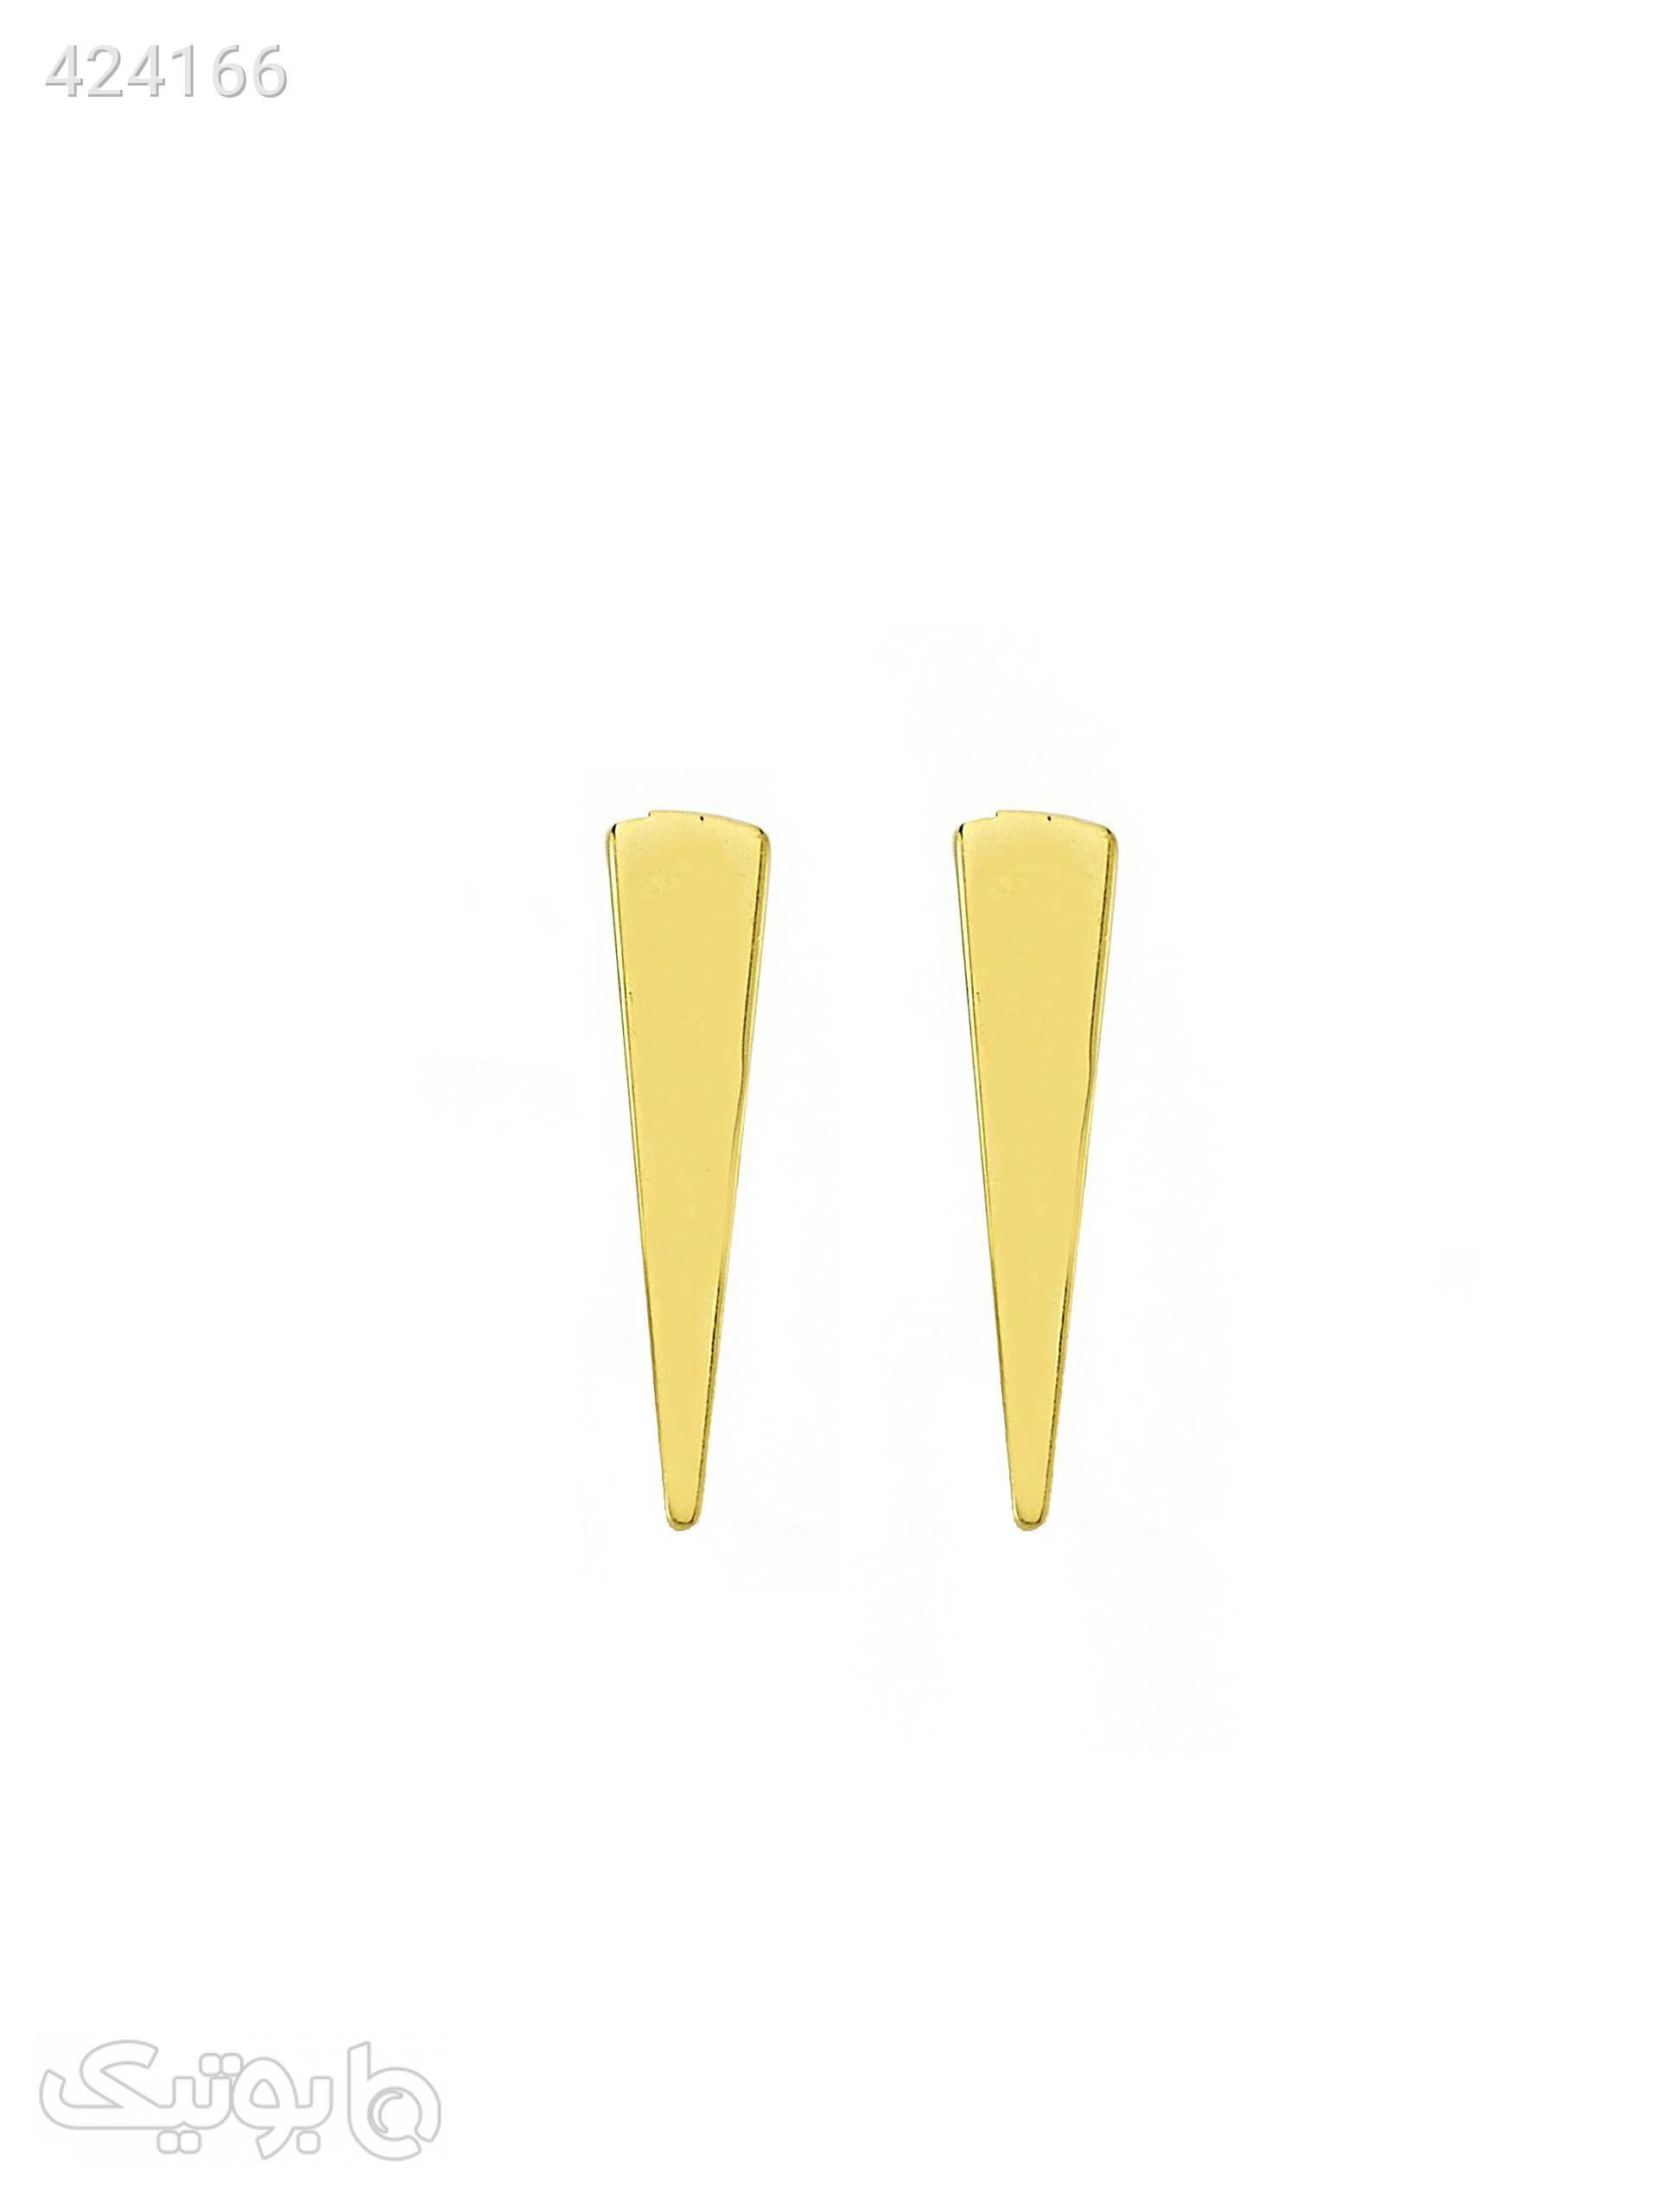 گوشواره طلا 18 عیار مدل GE121 طلایی گوشواره